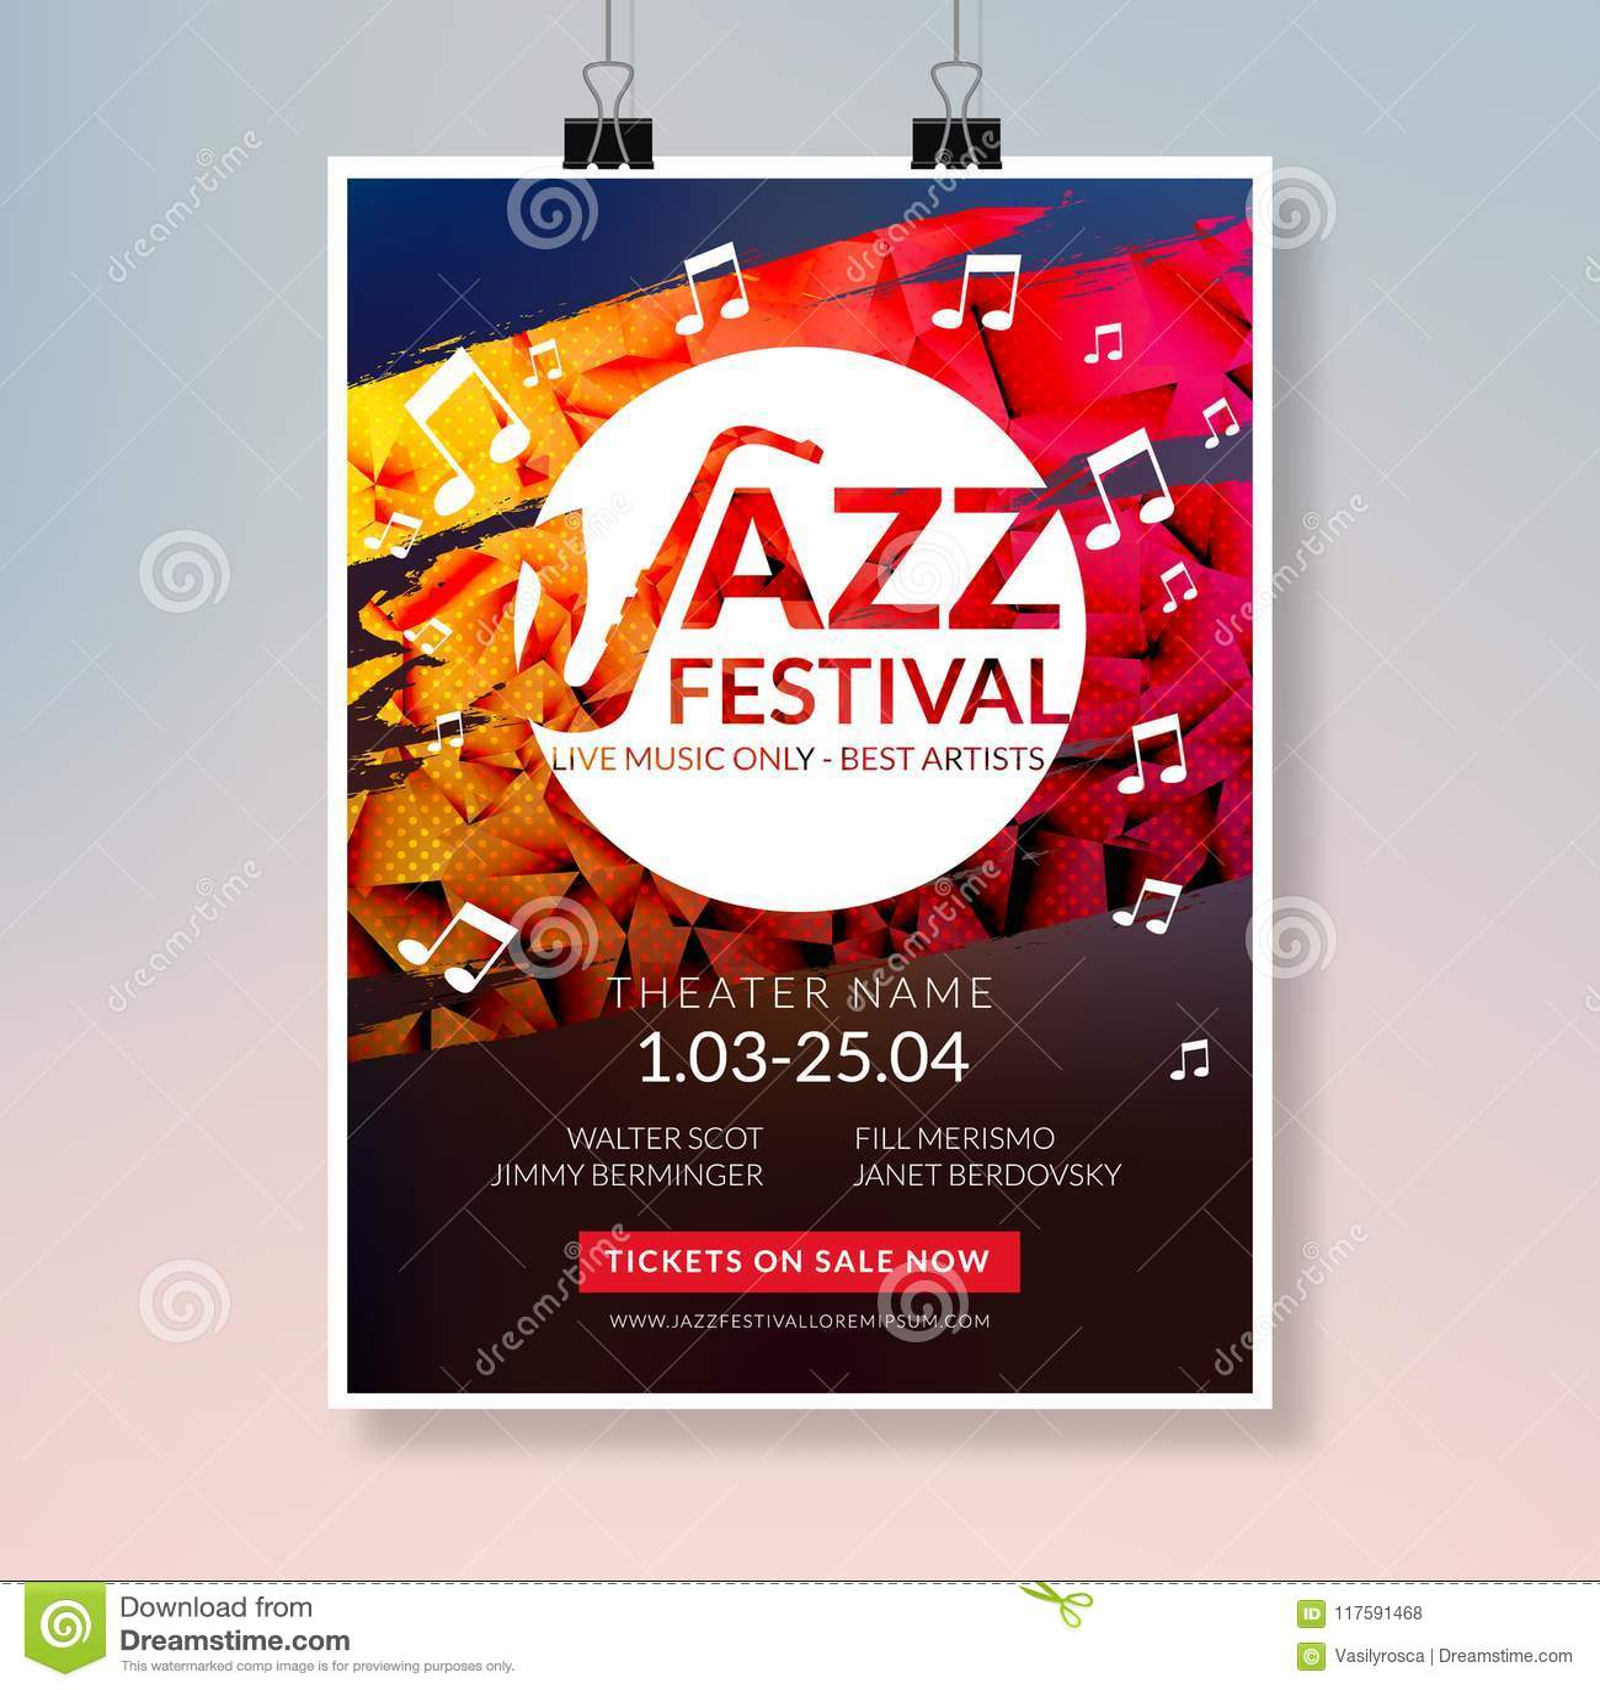 vector musical flyer jazz festival music concert poster background